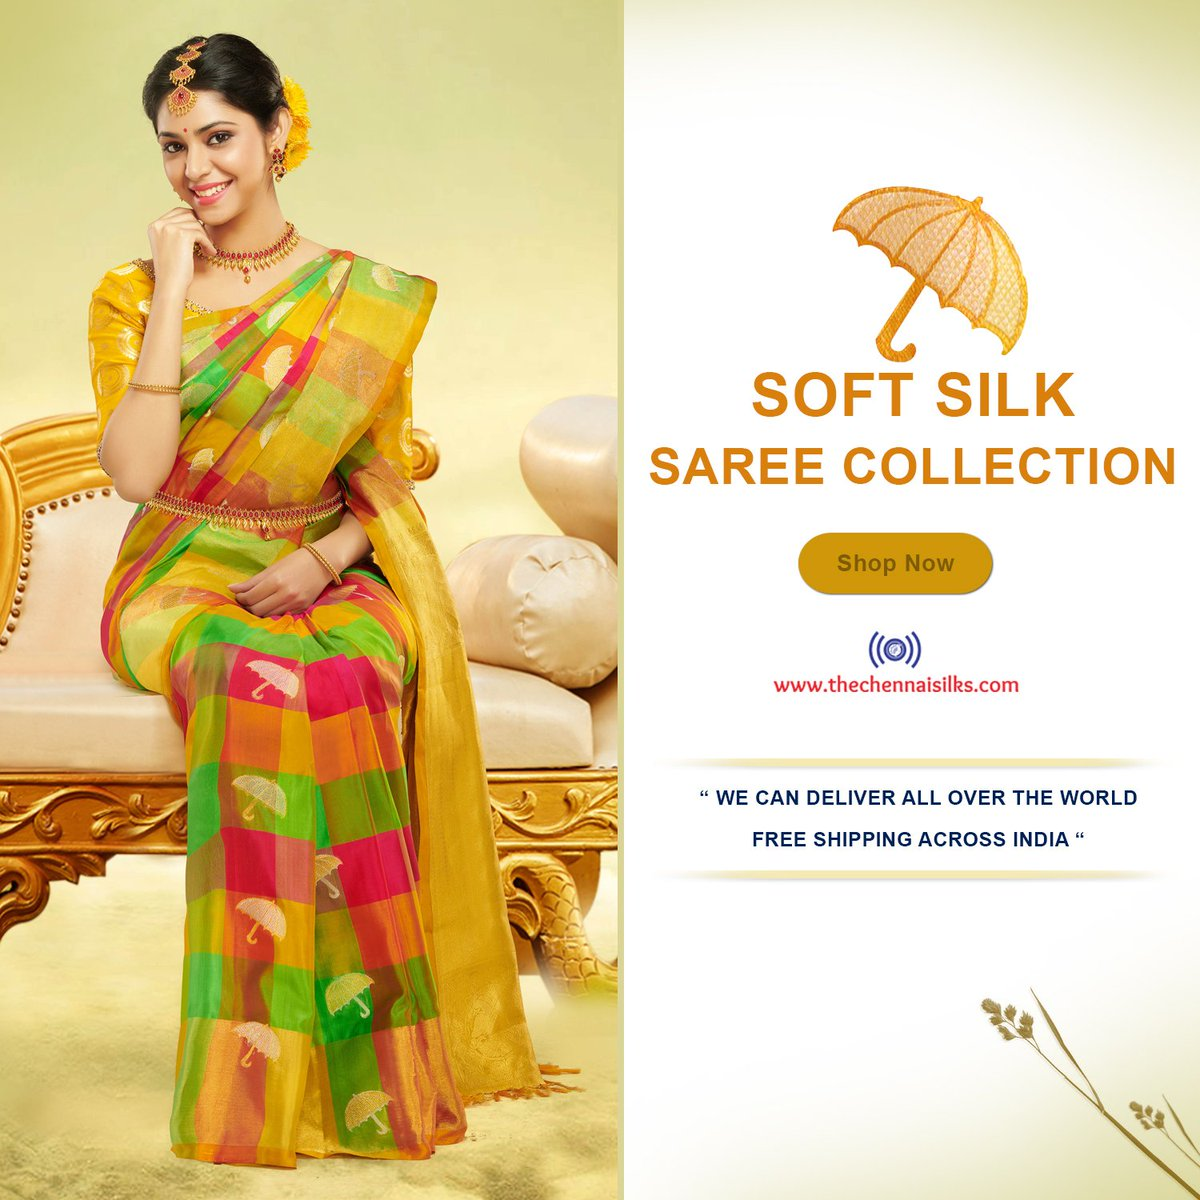 The Chennai Silks On Twitter New Arrival Soft Silk Saree Collection Shop Https T Co Fugvqsiv3g Softsilk Softsilksaree